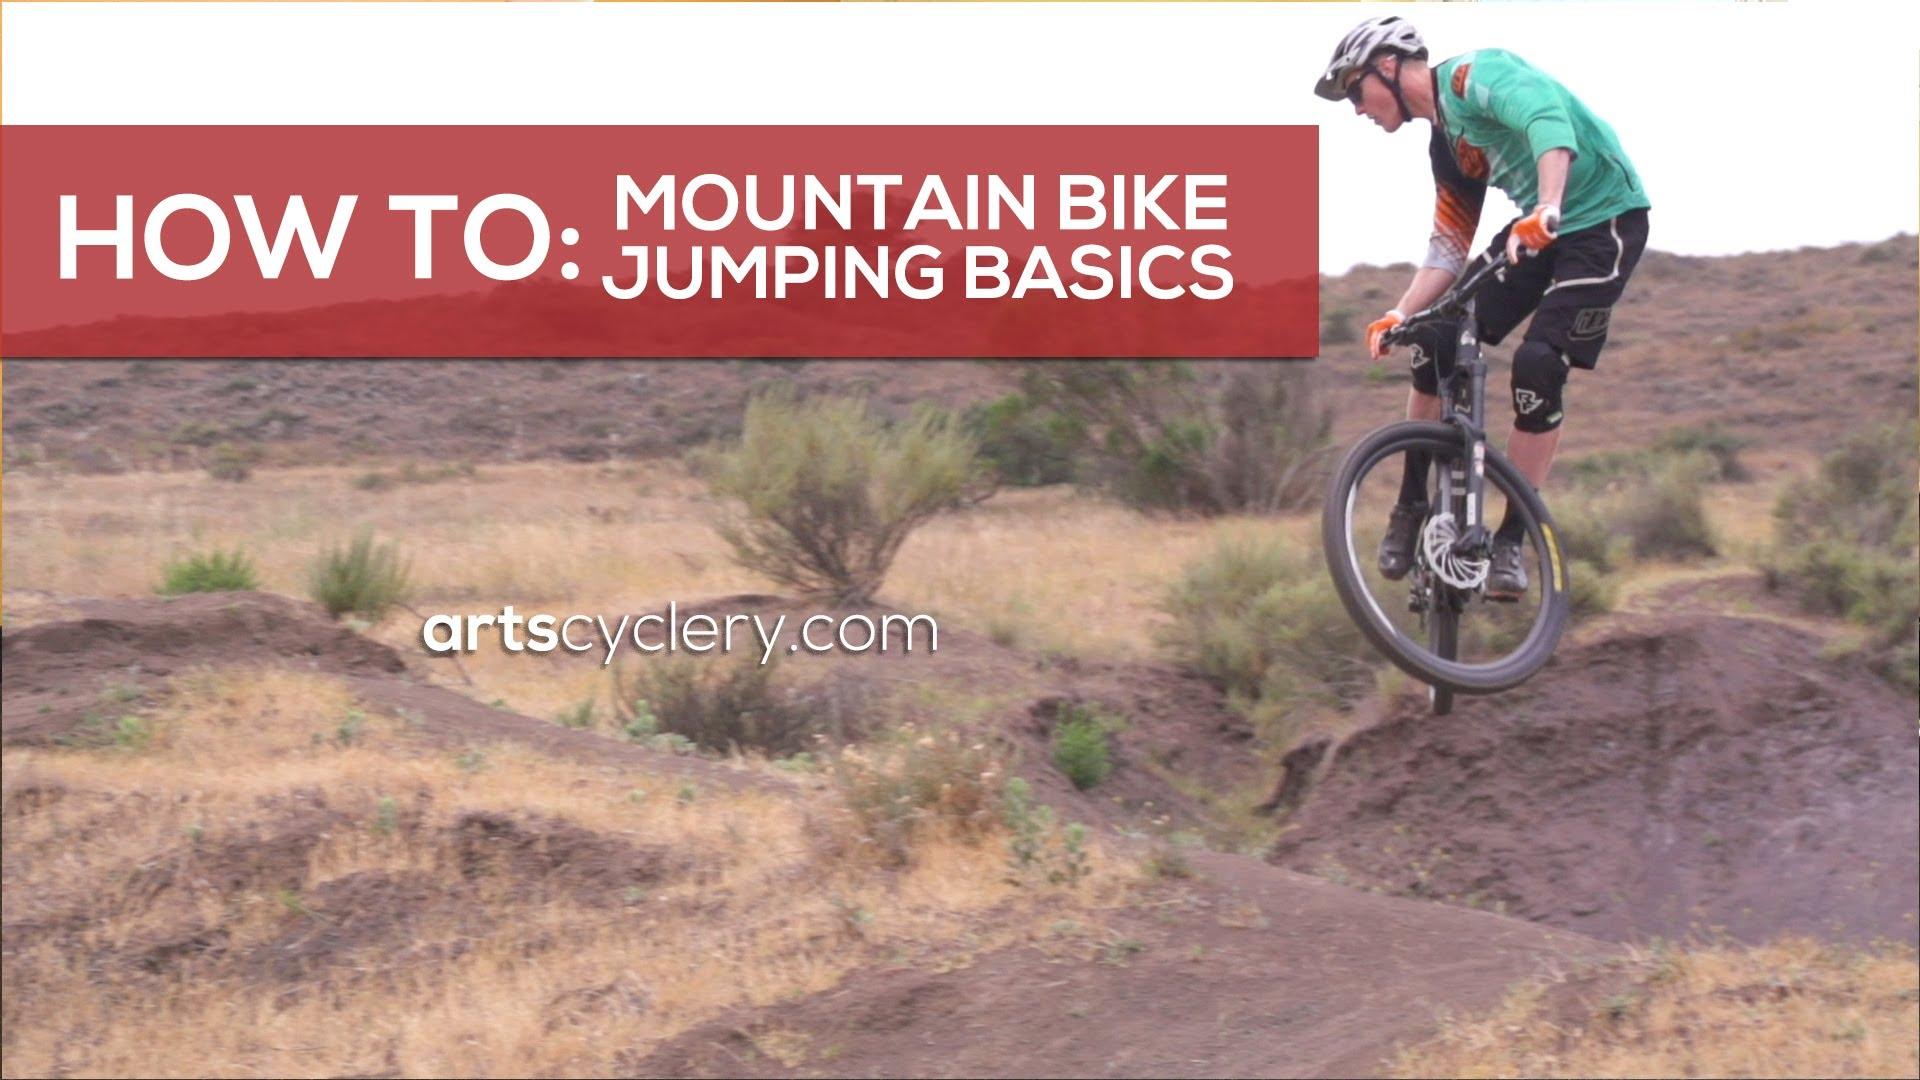 Mountain Bike Jumping Basics